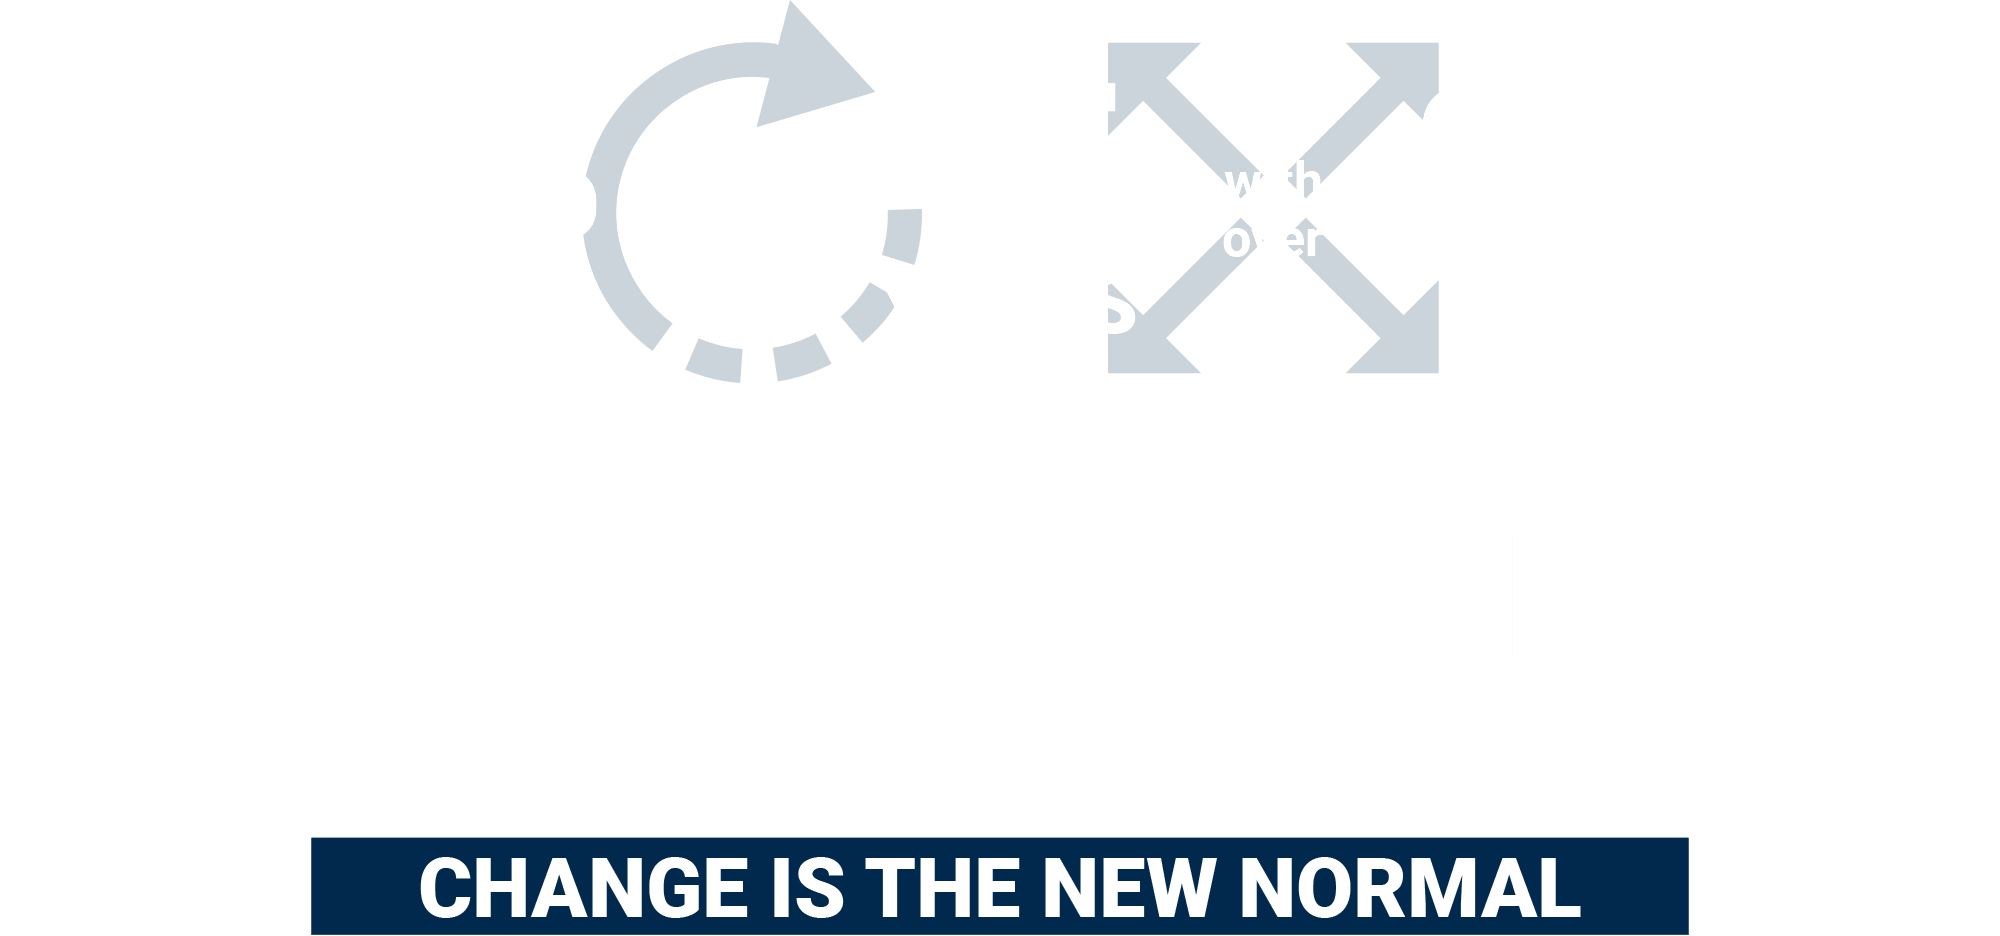 Transformation Infographic